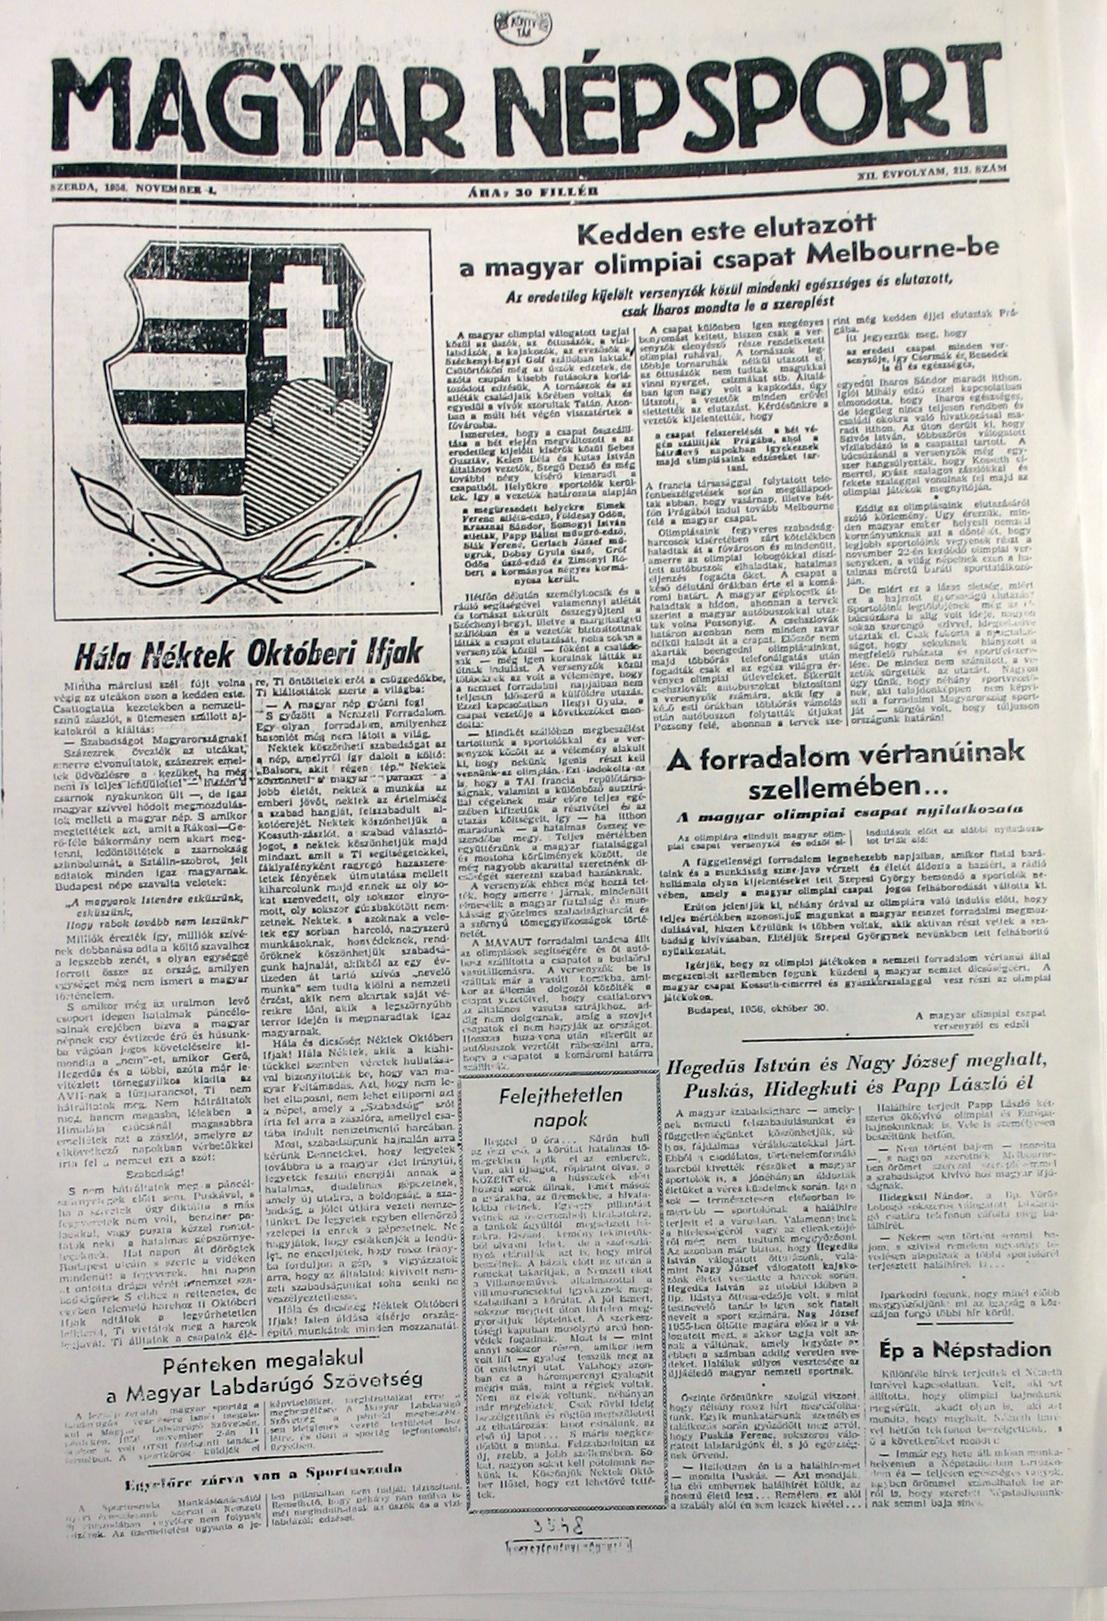 19561101_MAGYAR NÉPSPORT_010